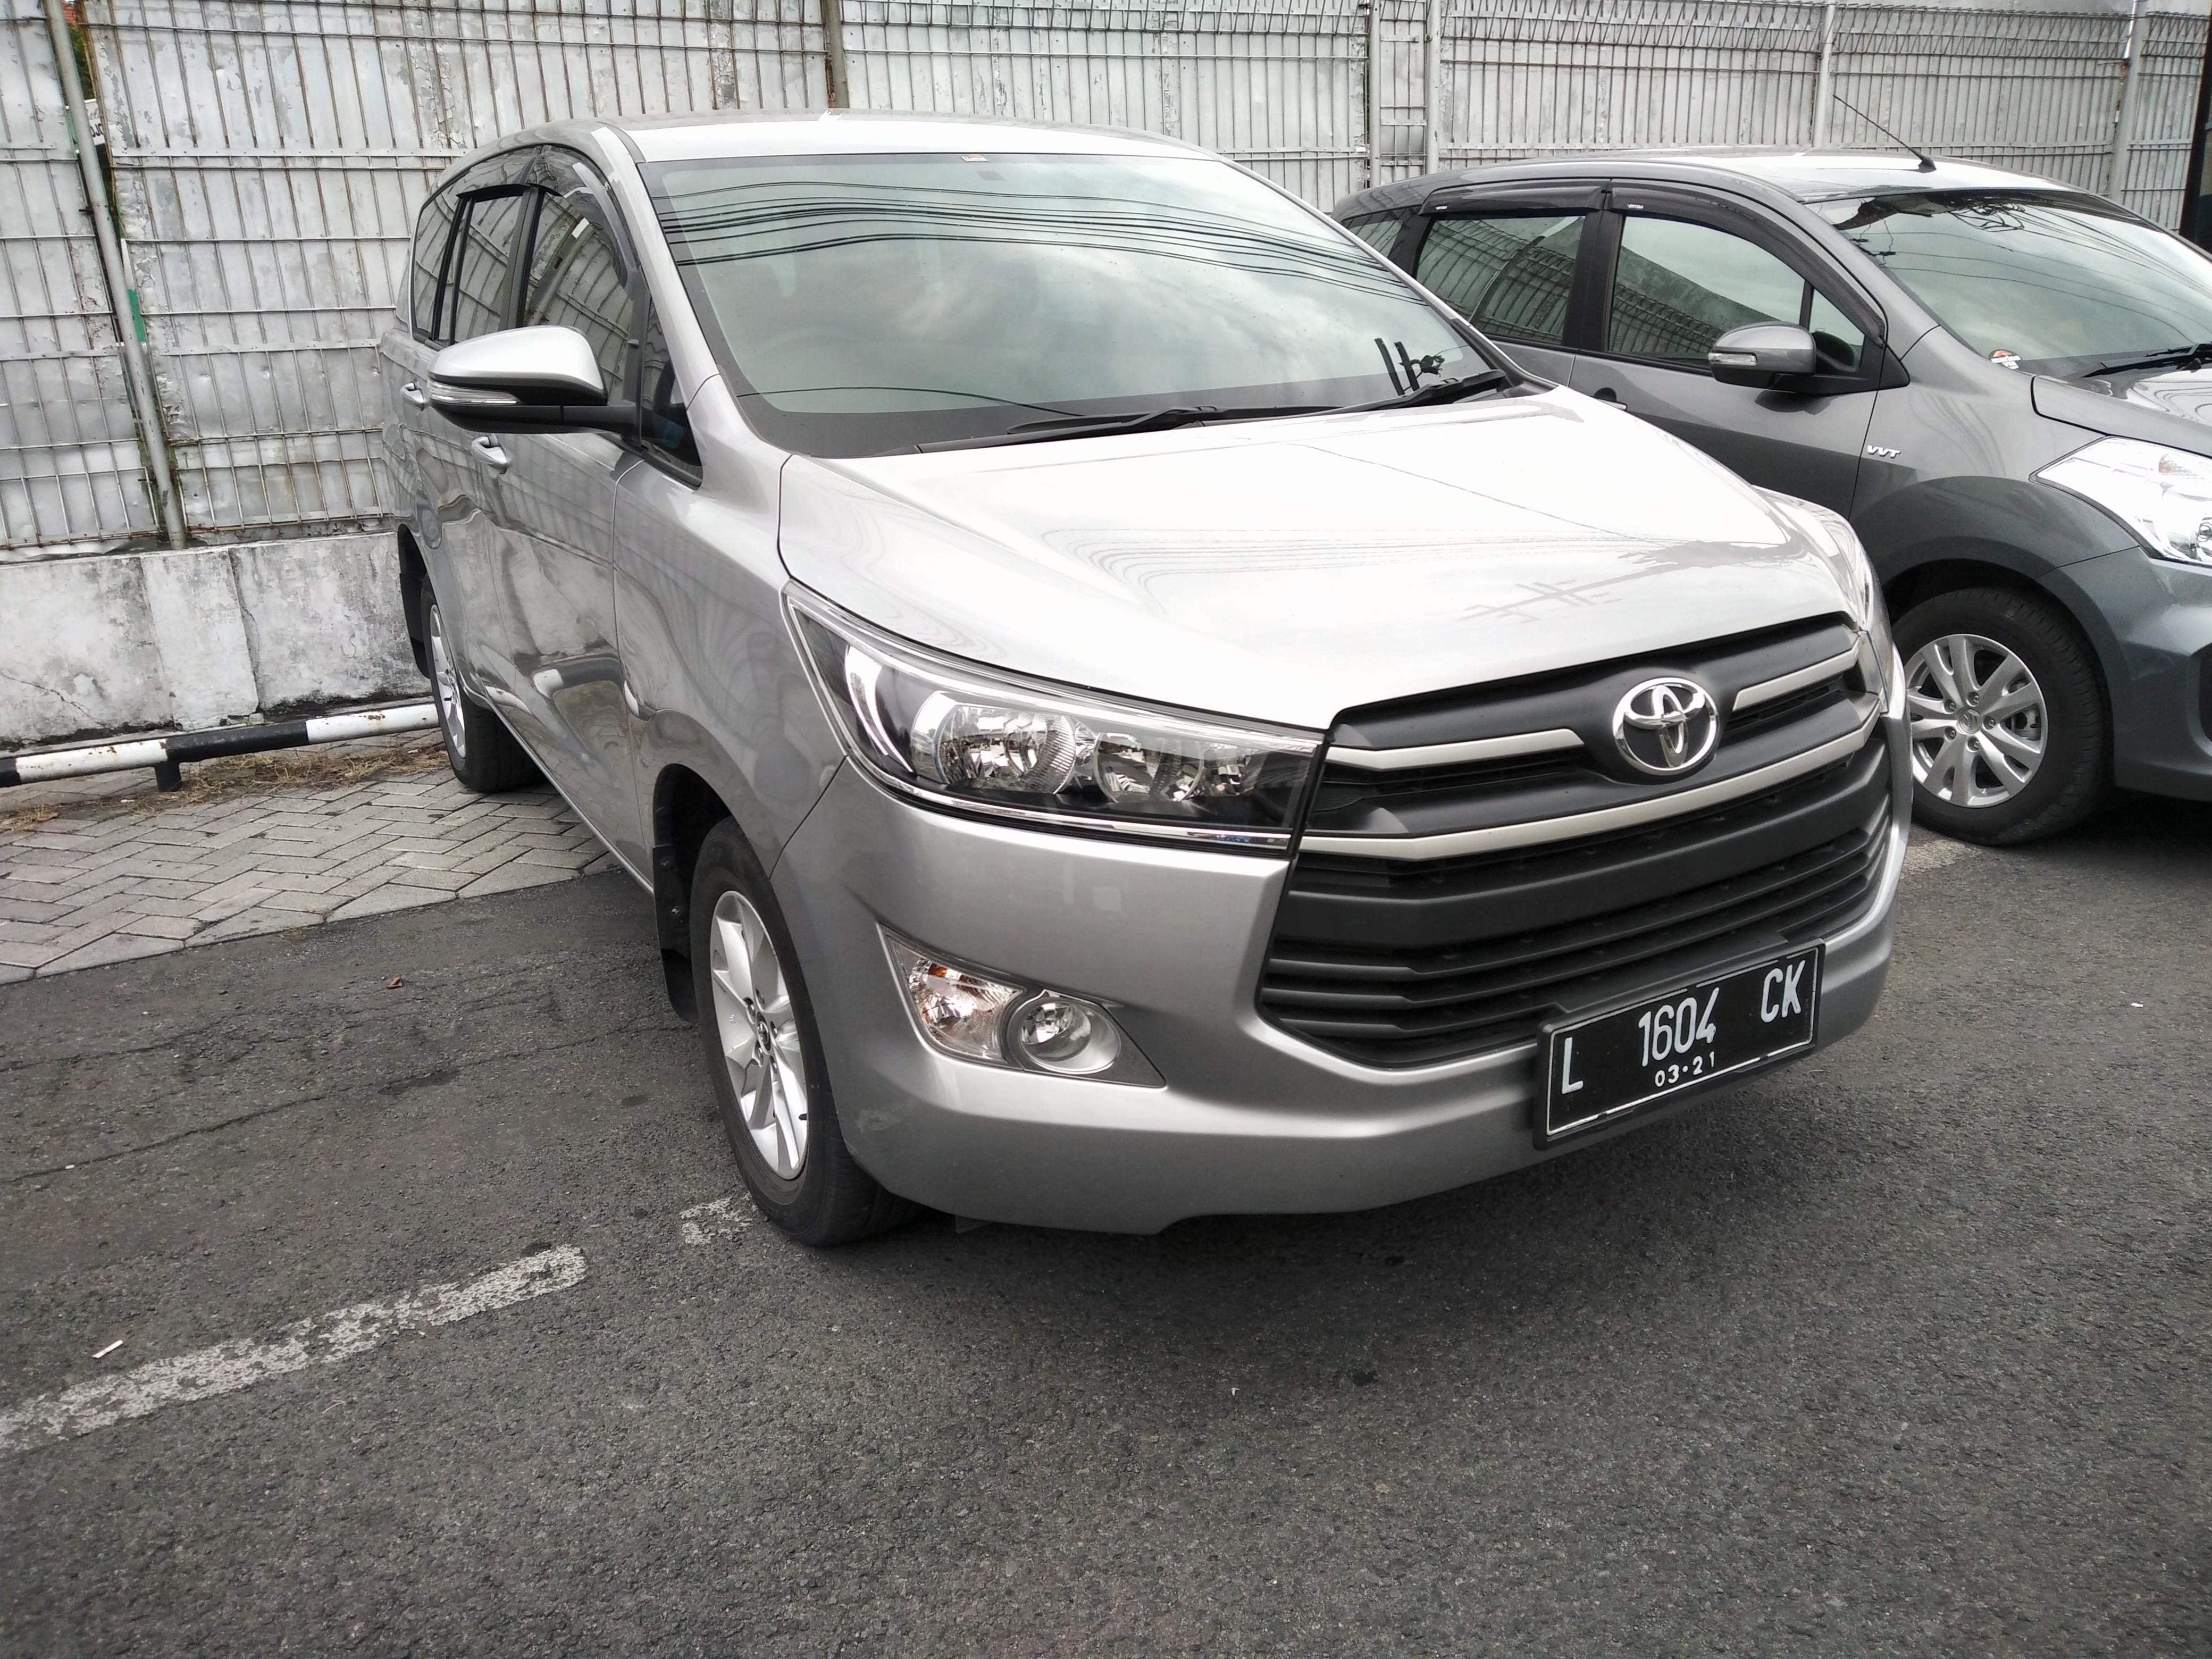 File:2016 Toyota Kijang Innova 2.4 G, East Surabaya.jpg